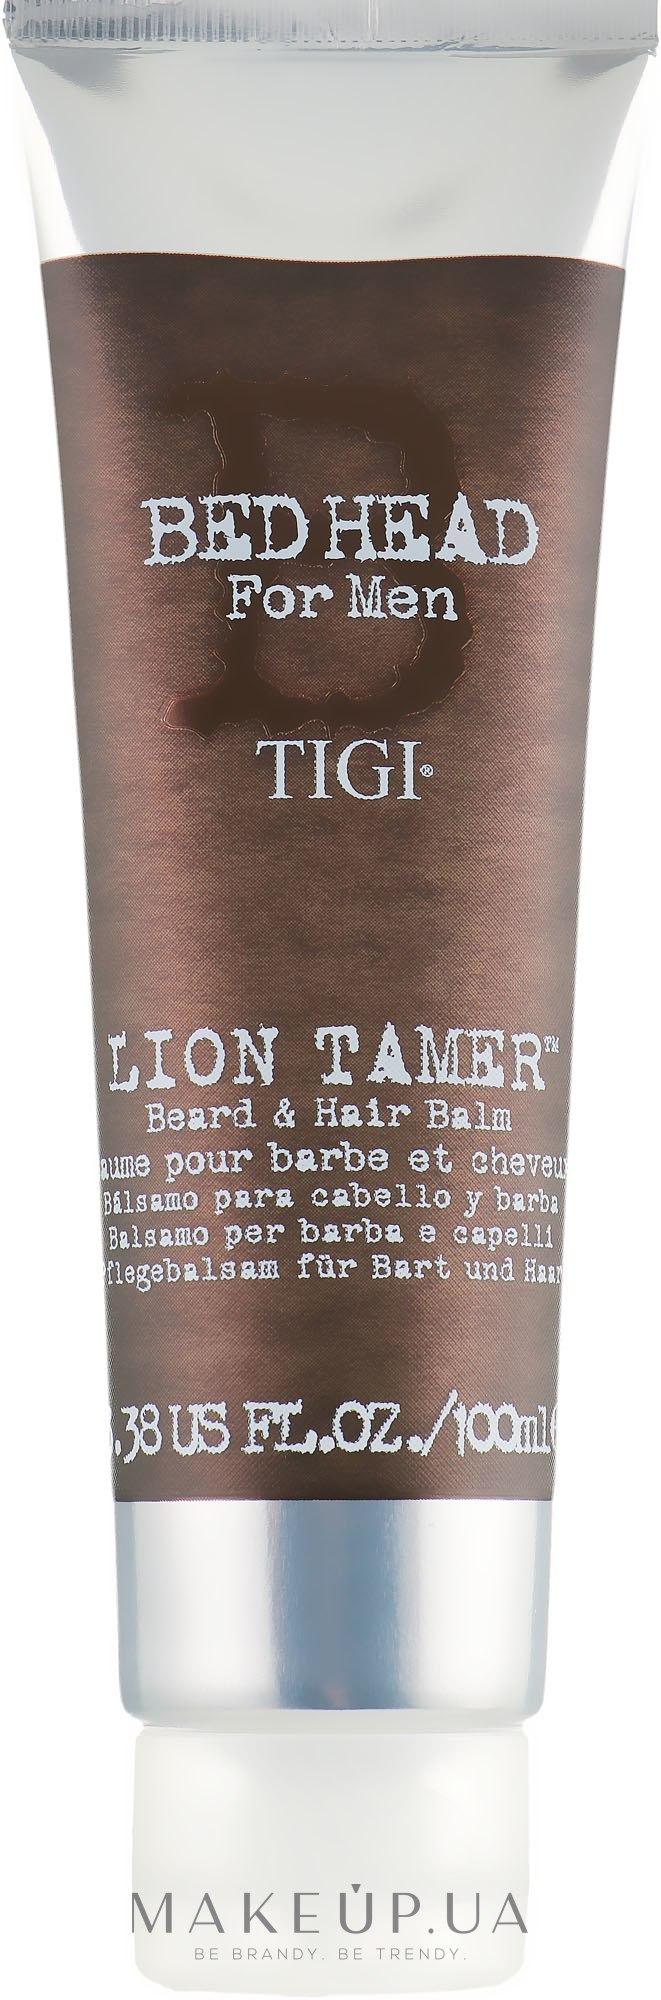 Бальзам для бороды и волос - Tigi Bed Head For Men Lion Tamer Beard & Hair Balm — фото 100ml